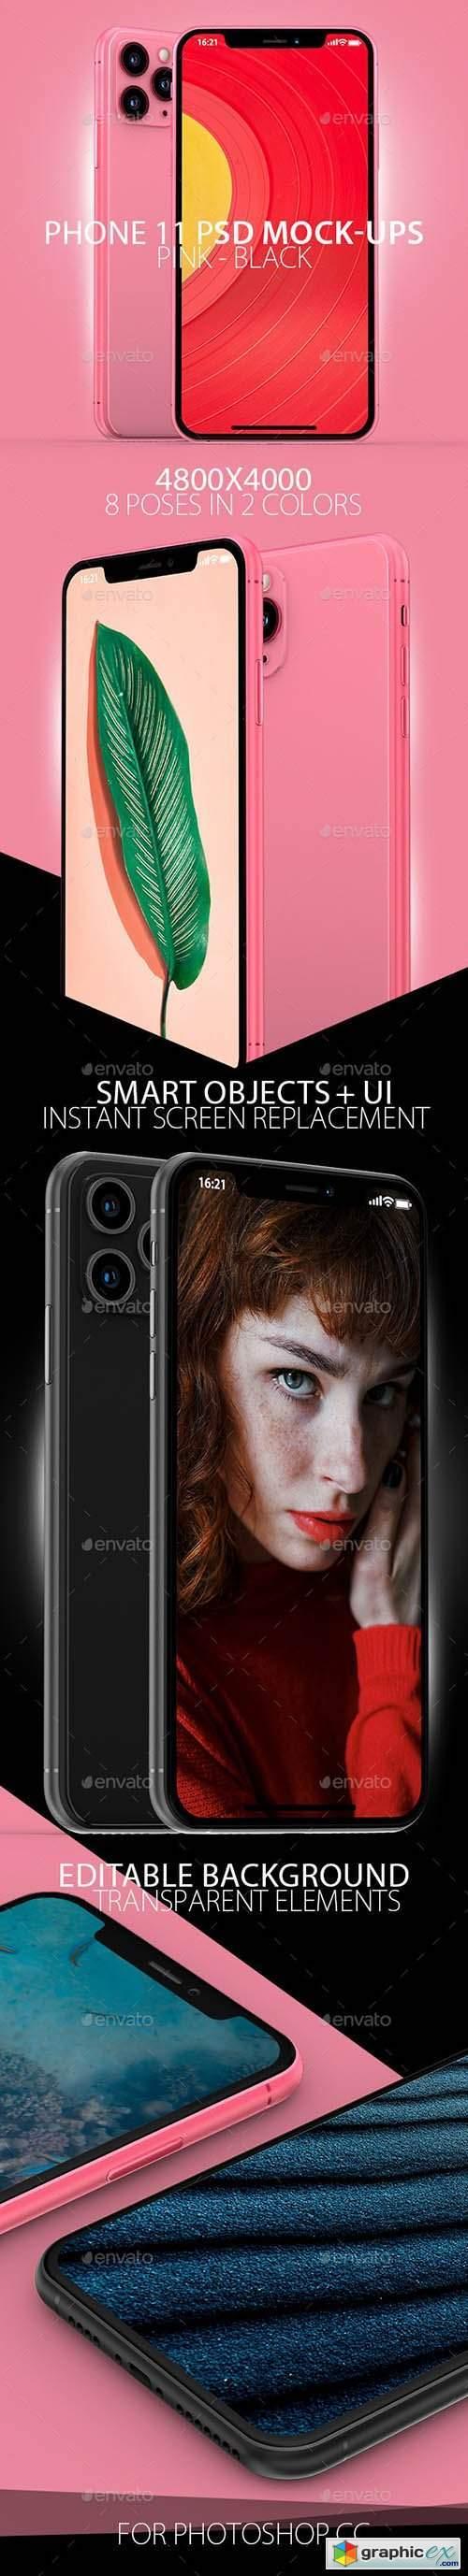 Black & Pink Phone 11 PSD Mock-ups